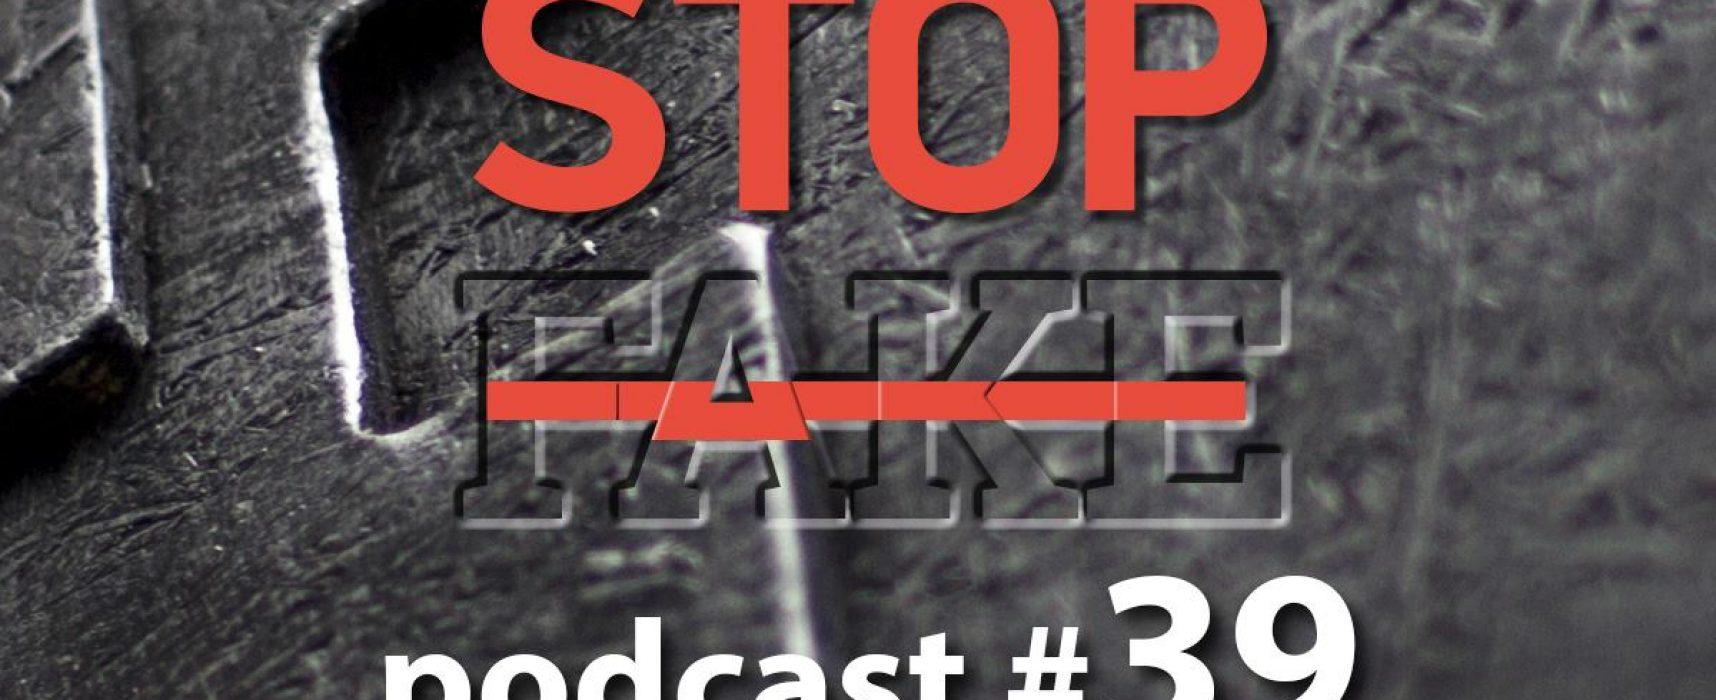 StopFake podcast #39